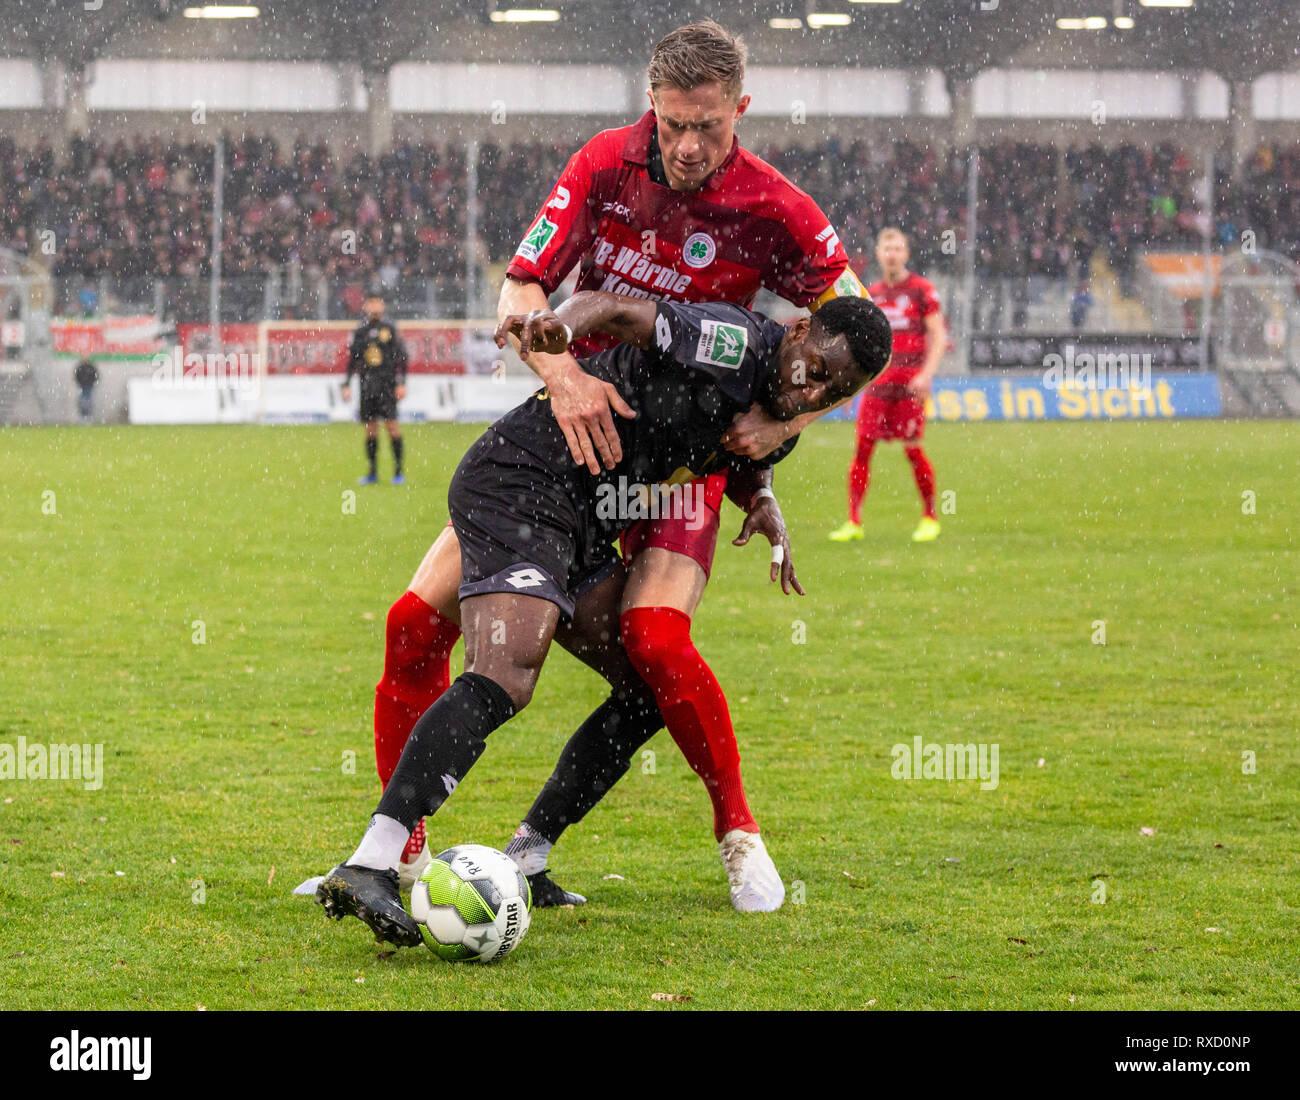 sports, football, Regional League West, 2018/2019, Rot Weiss Oberhausen vs Bonner SC 01/04 4-0, Stadium Niederrhein in Oberhausen, scene of the match, ahead Bernard Mwarome (Bonn), behind Jannik Loehden (RWO) - Stock Image